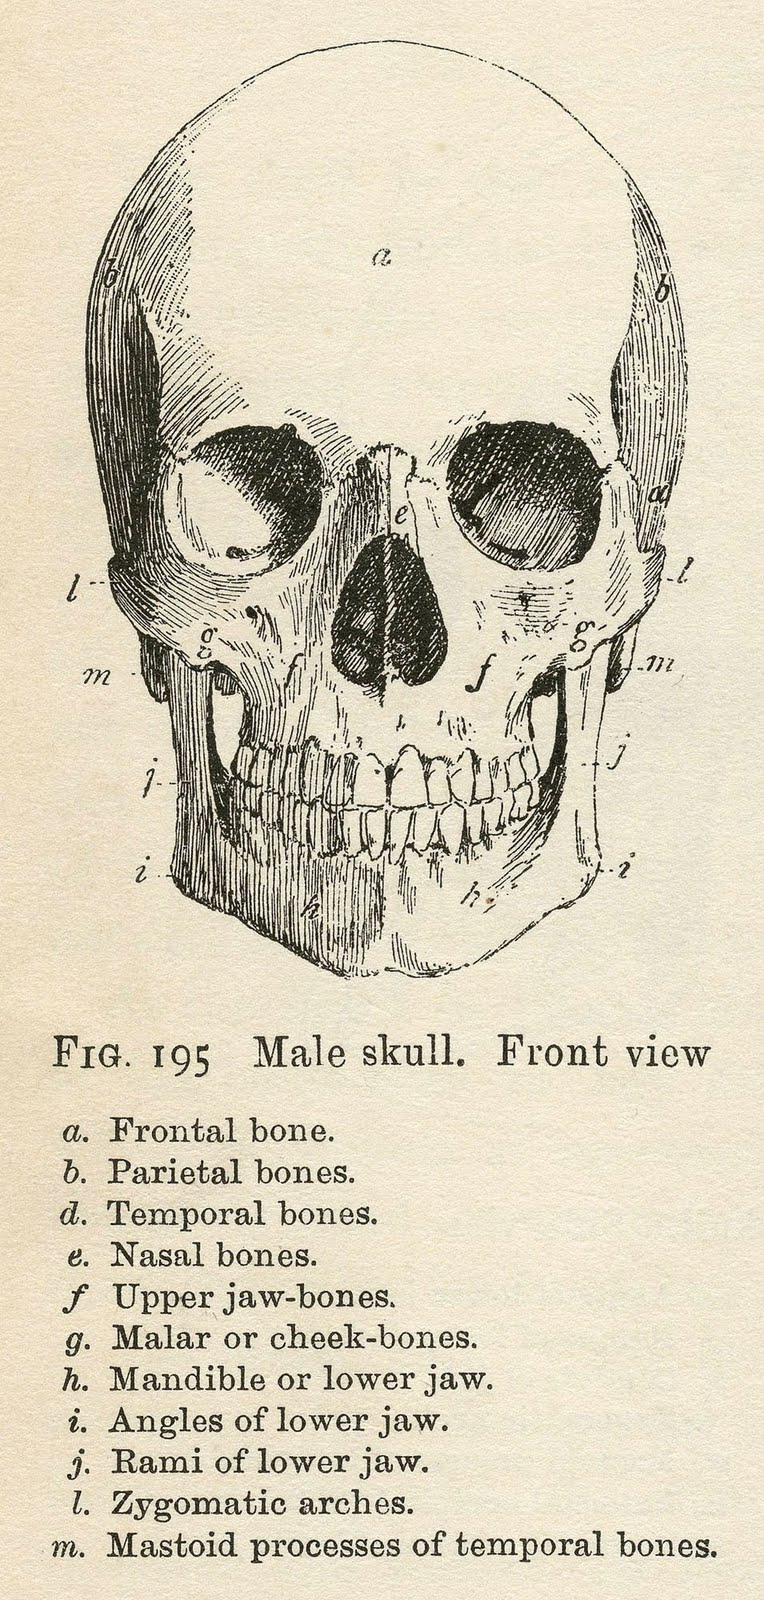 Halloween printable clipart clip art library Vintage Anatomy Clip Art - Bones & Skull - Halloween - The ... clip art library